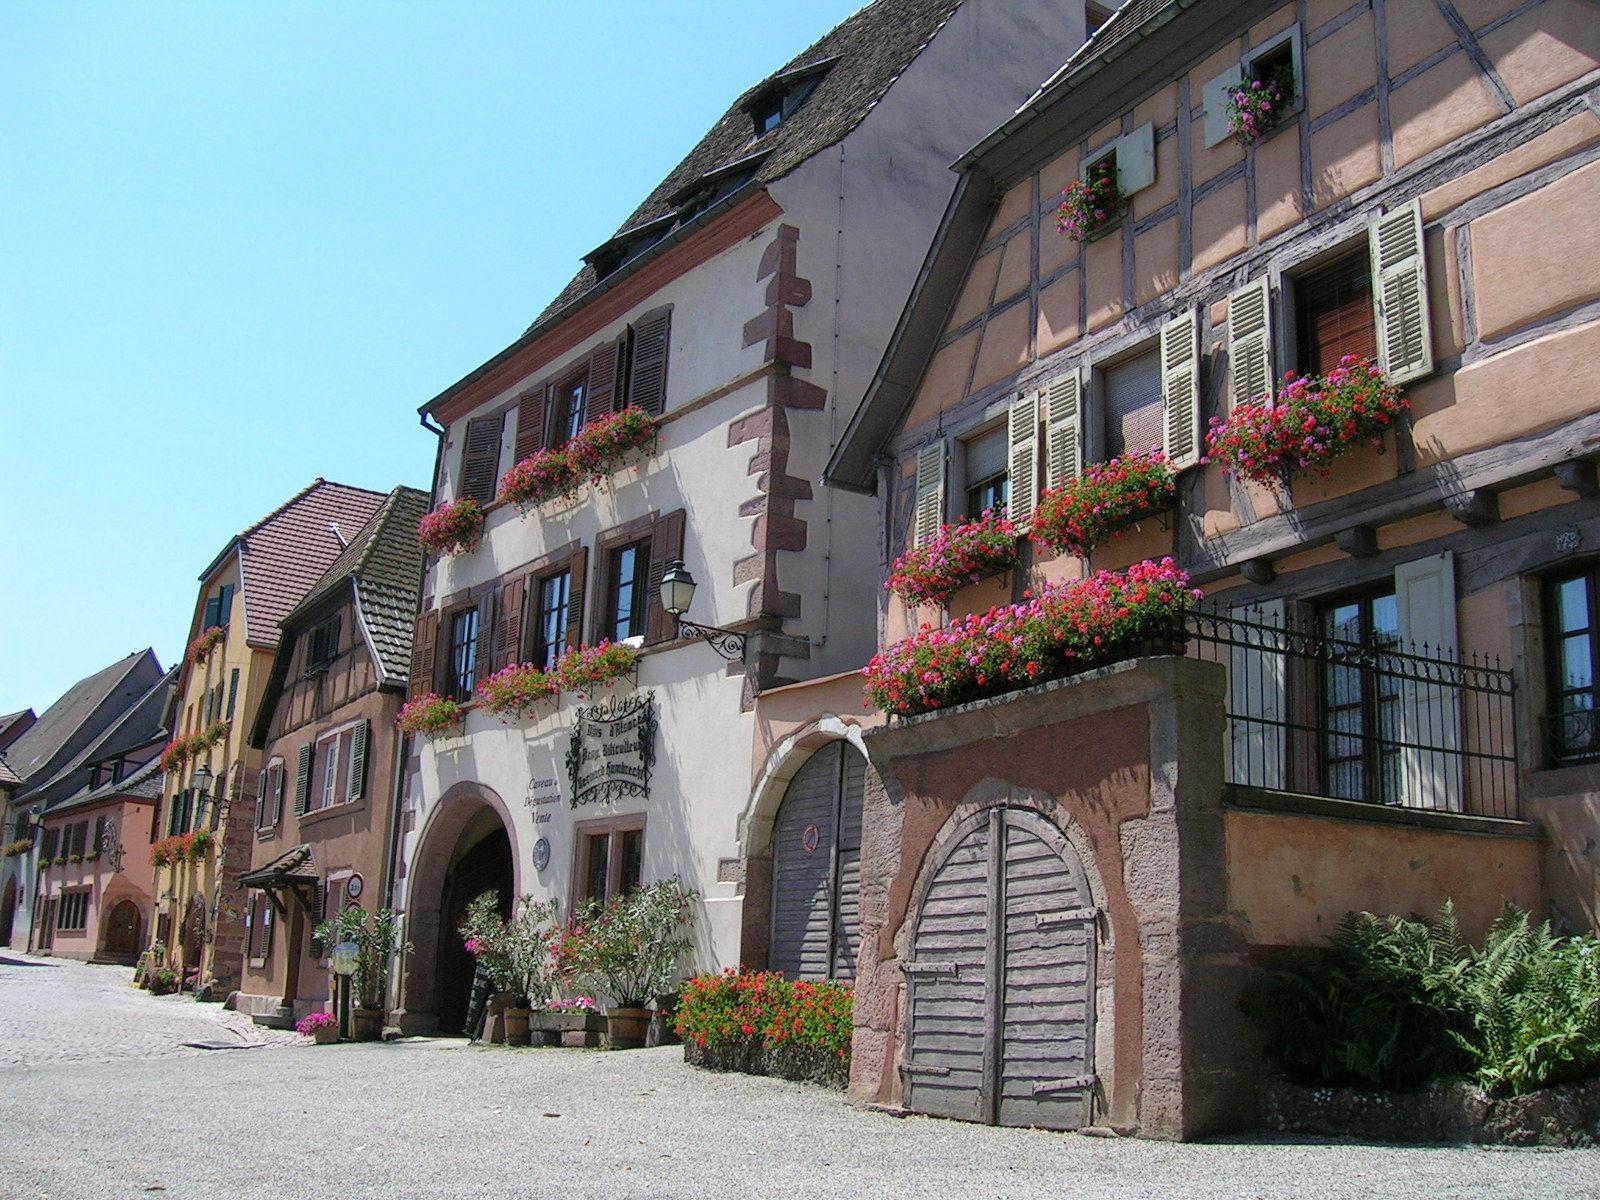 https://apps.tourisme-alsace.info/photos/eguisheim/photos/253002441_1.JPG